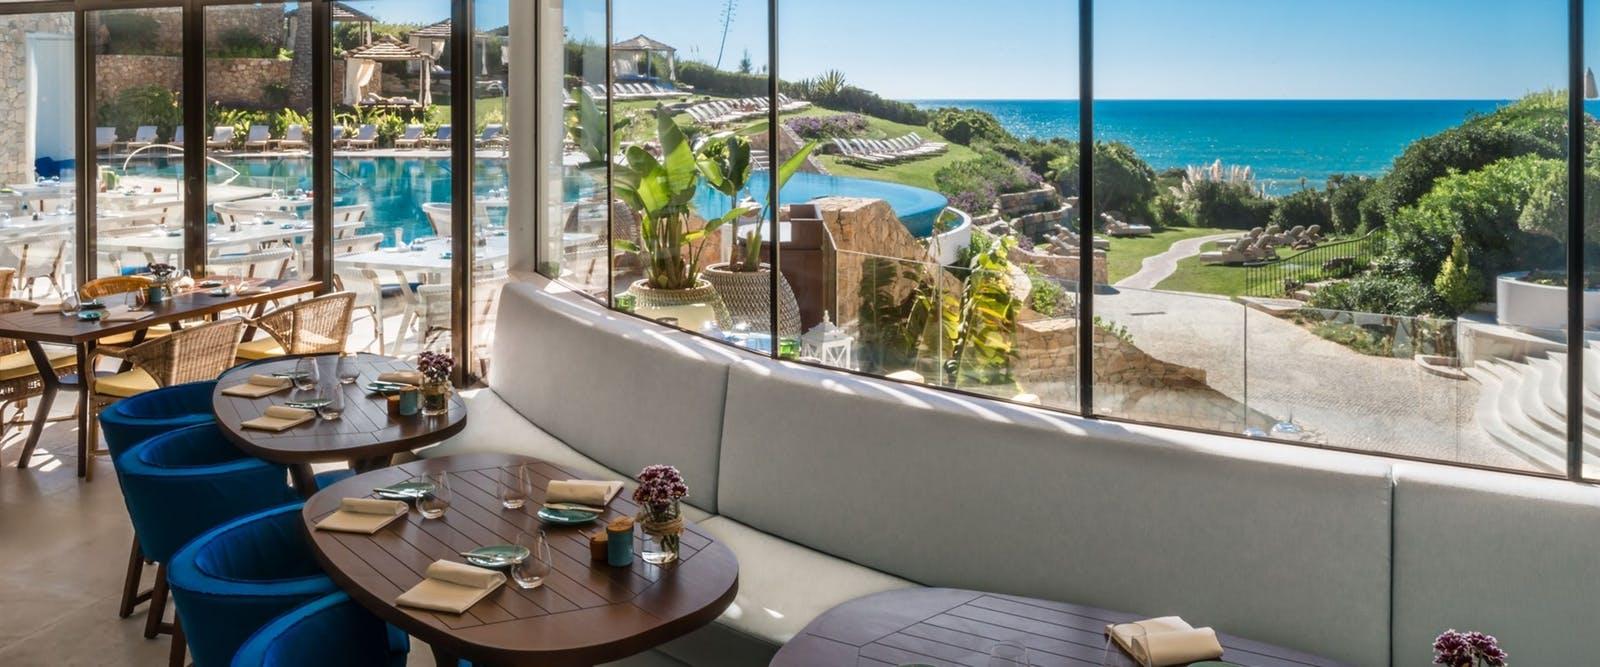 whale-restaurant-vila-vita-parc